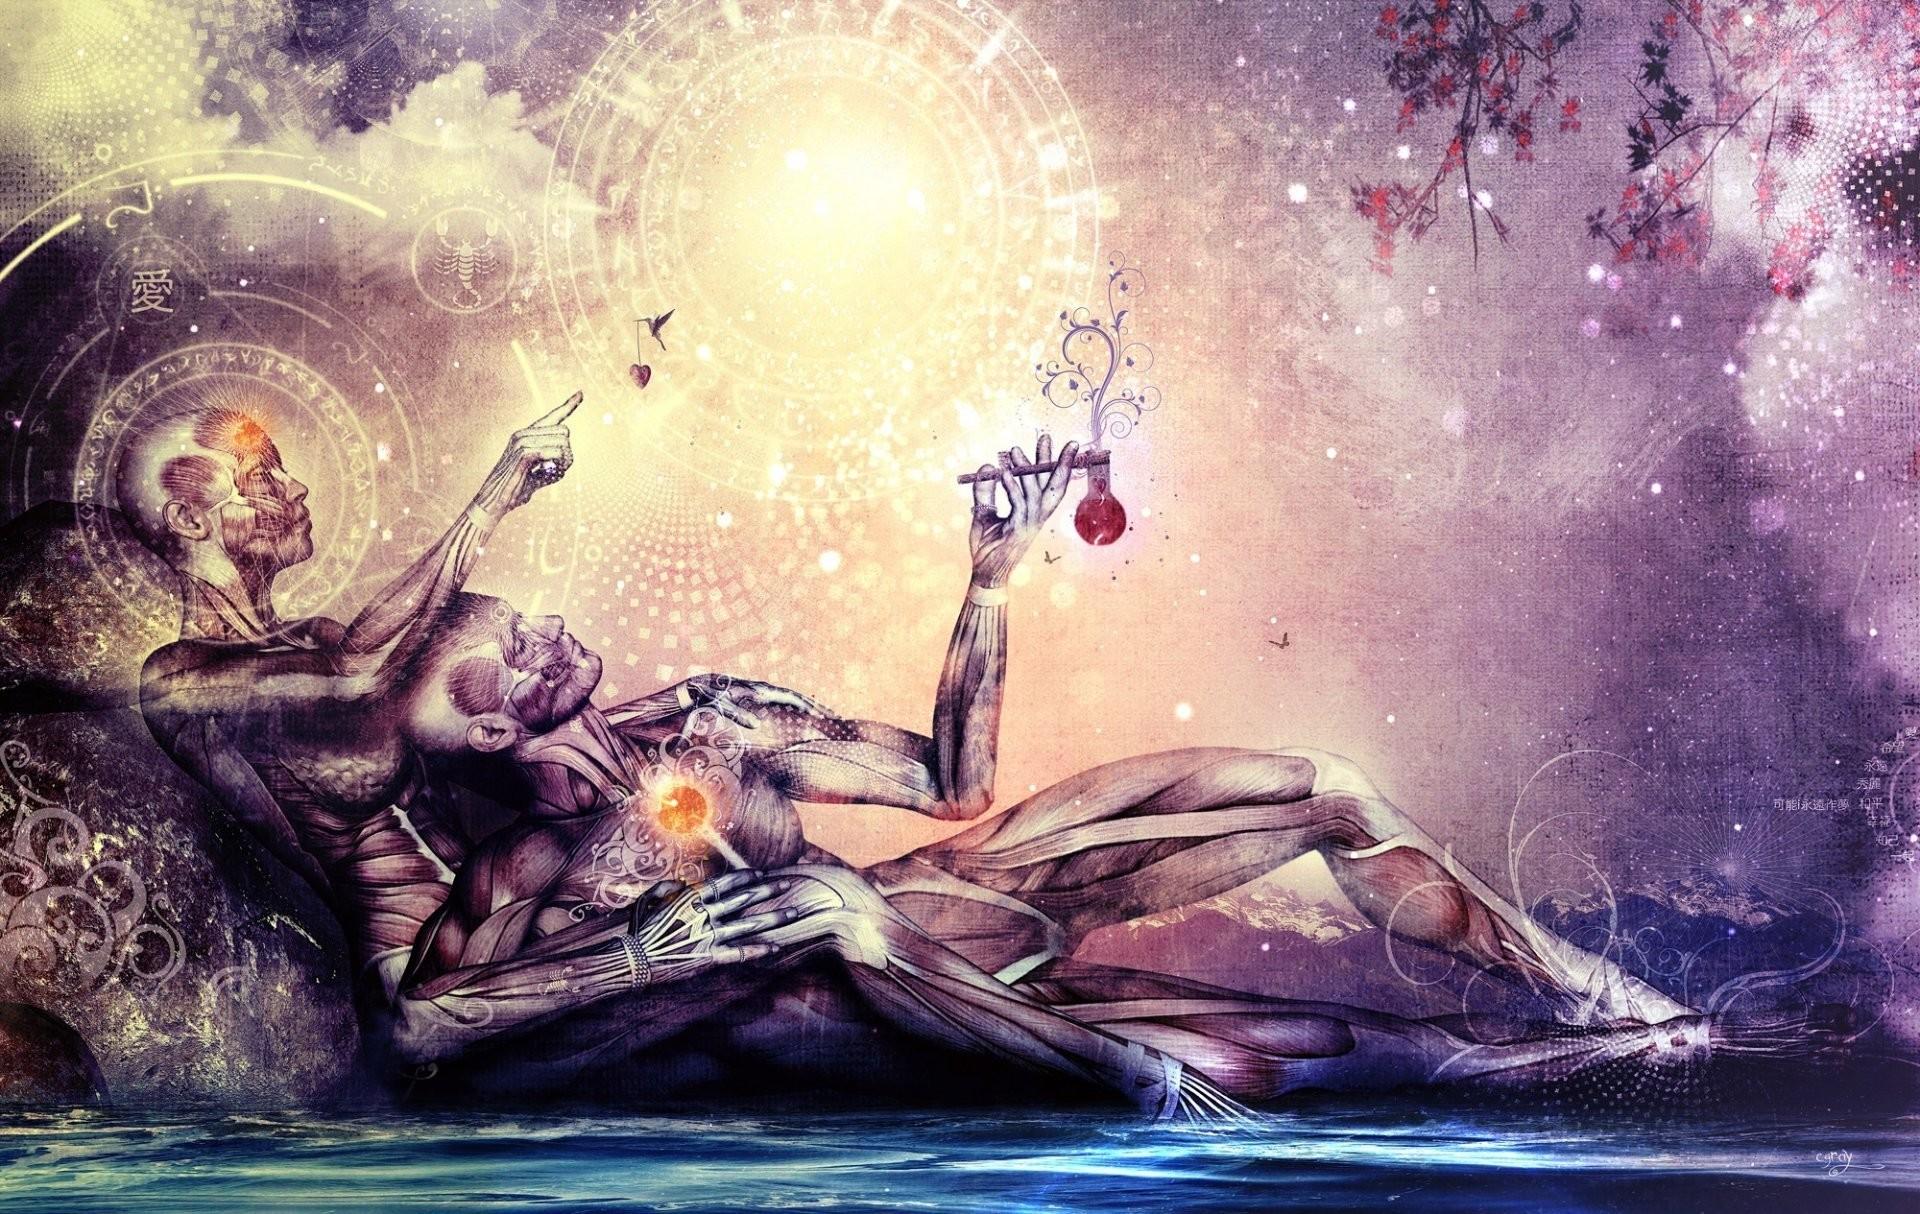 cameron gray art two men a woman anatomy chakra symbols water sky  contemplation spirituality zodiac